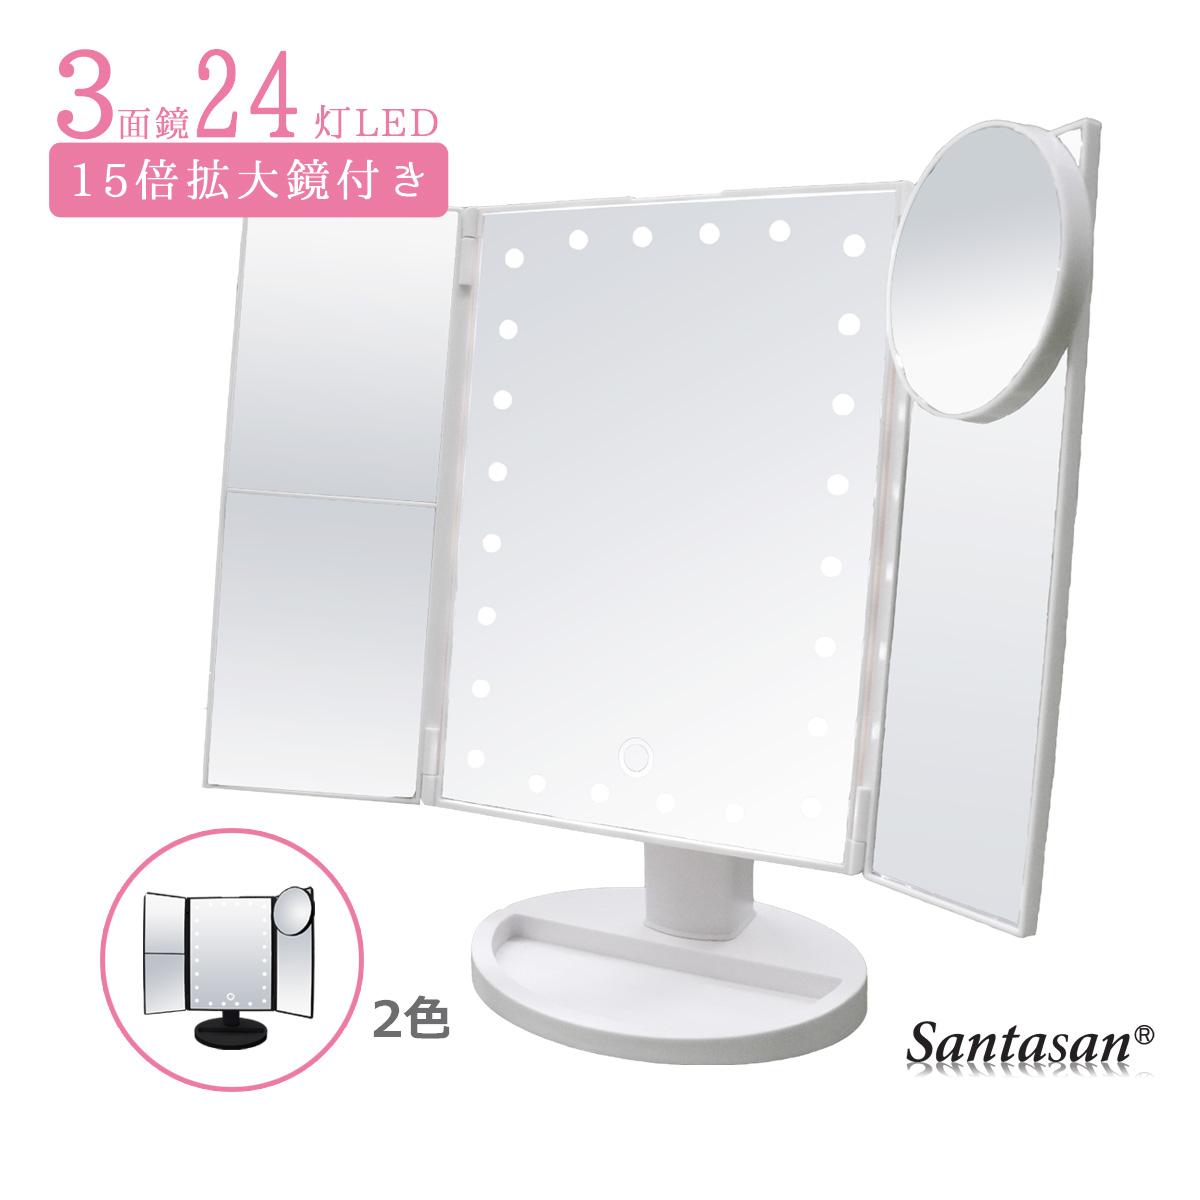 Actress Mirror Kumi May Rahv Light Mirror Desk Mirror Stands Mirror With The Mirror Light With The Led Mirror 24 Light Led Three Mirror 15 Times